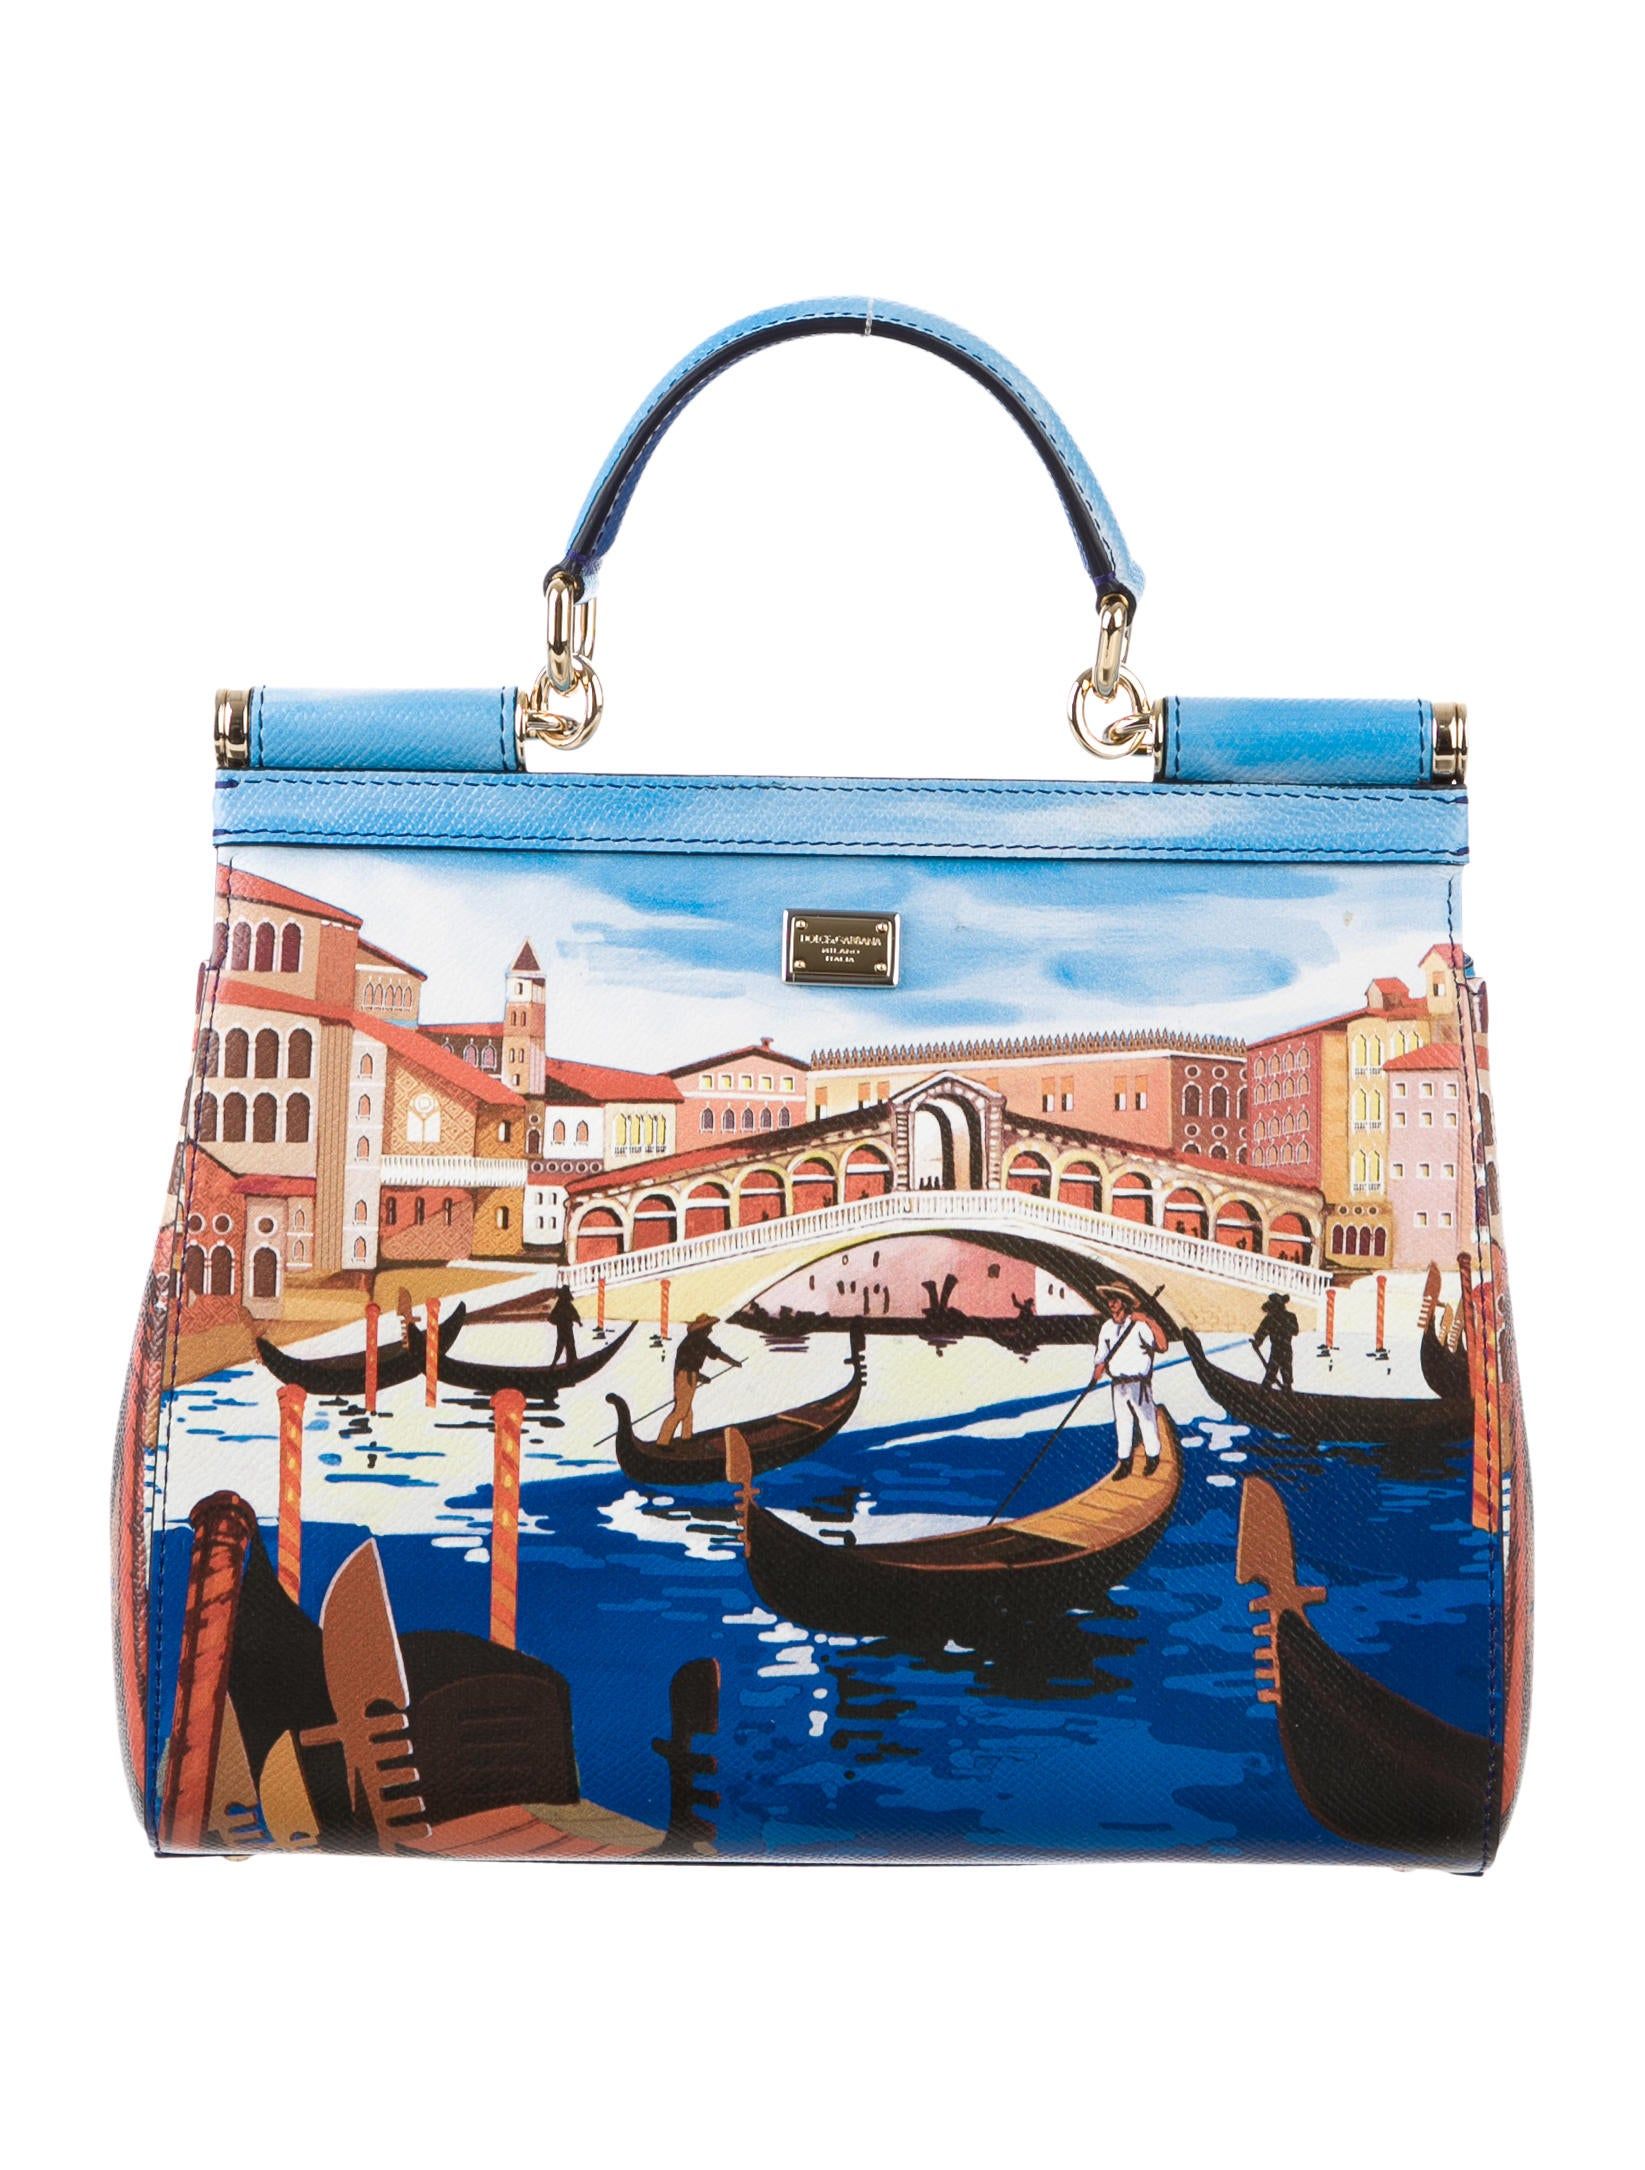 Dolce Amp Gabbana 2016 Miss Sicily Venezia Bag Handbags